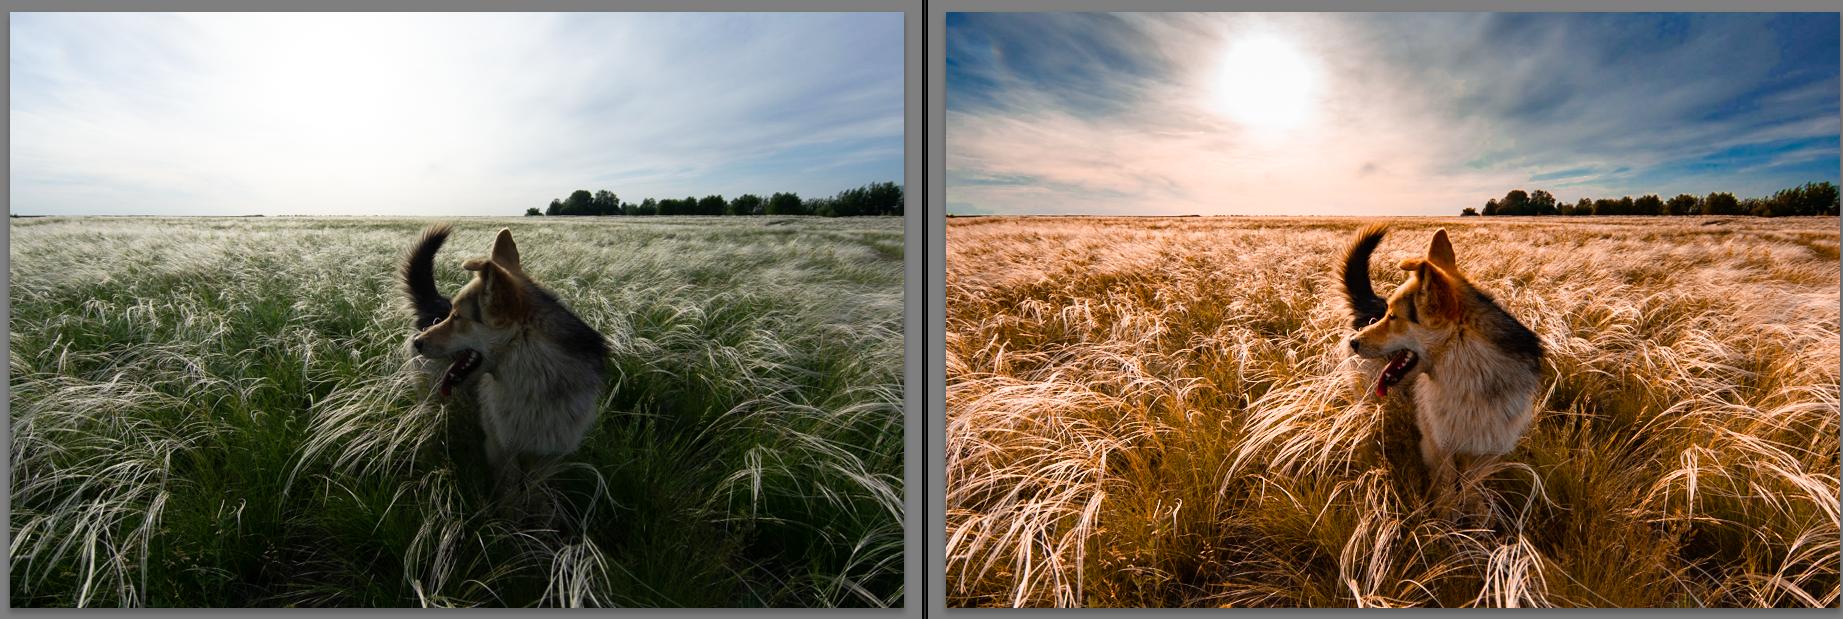 Обои картина, fotoshop, осен, экспозиция. Разное